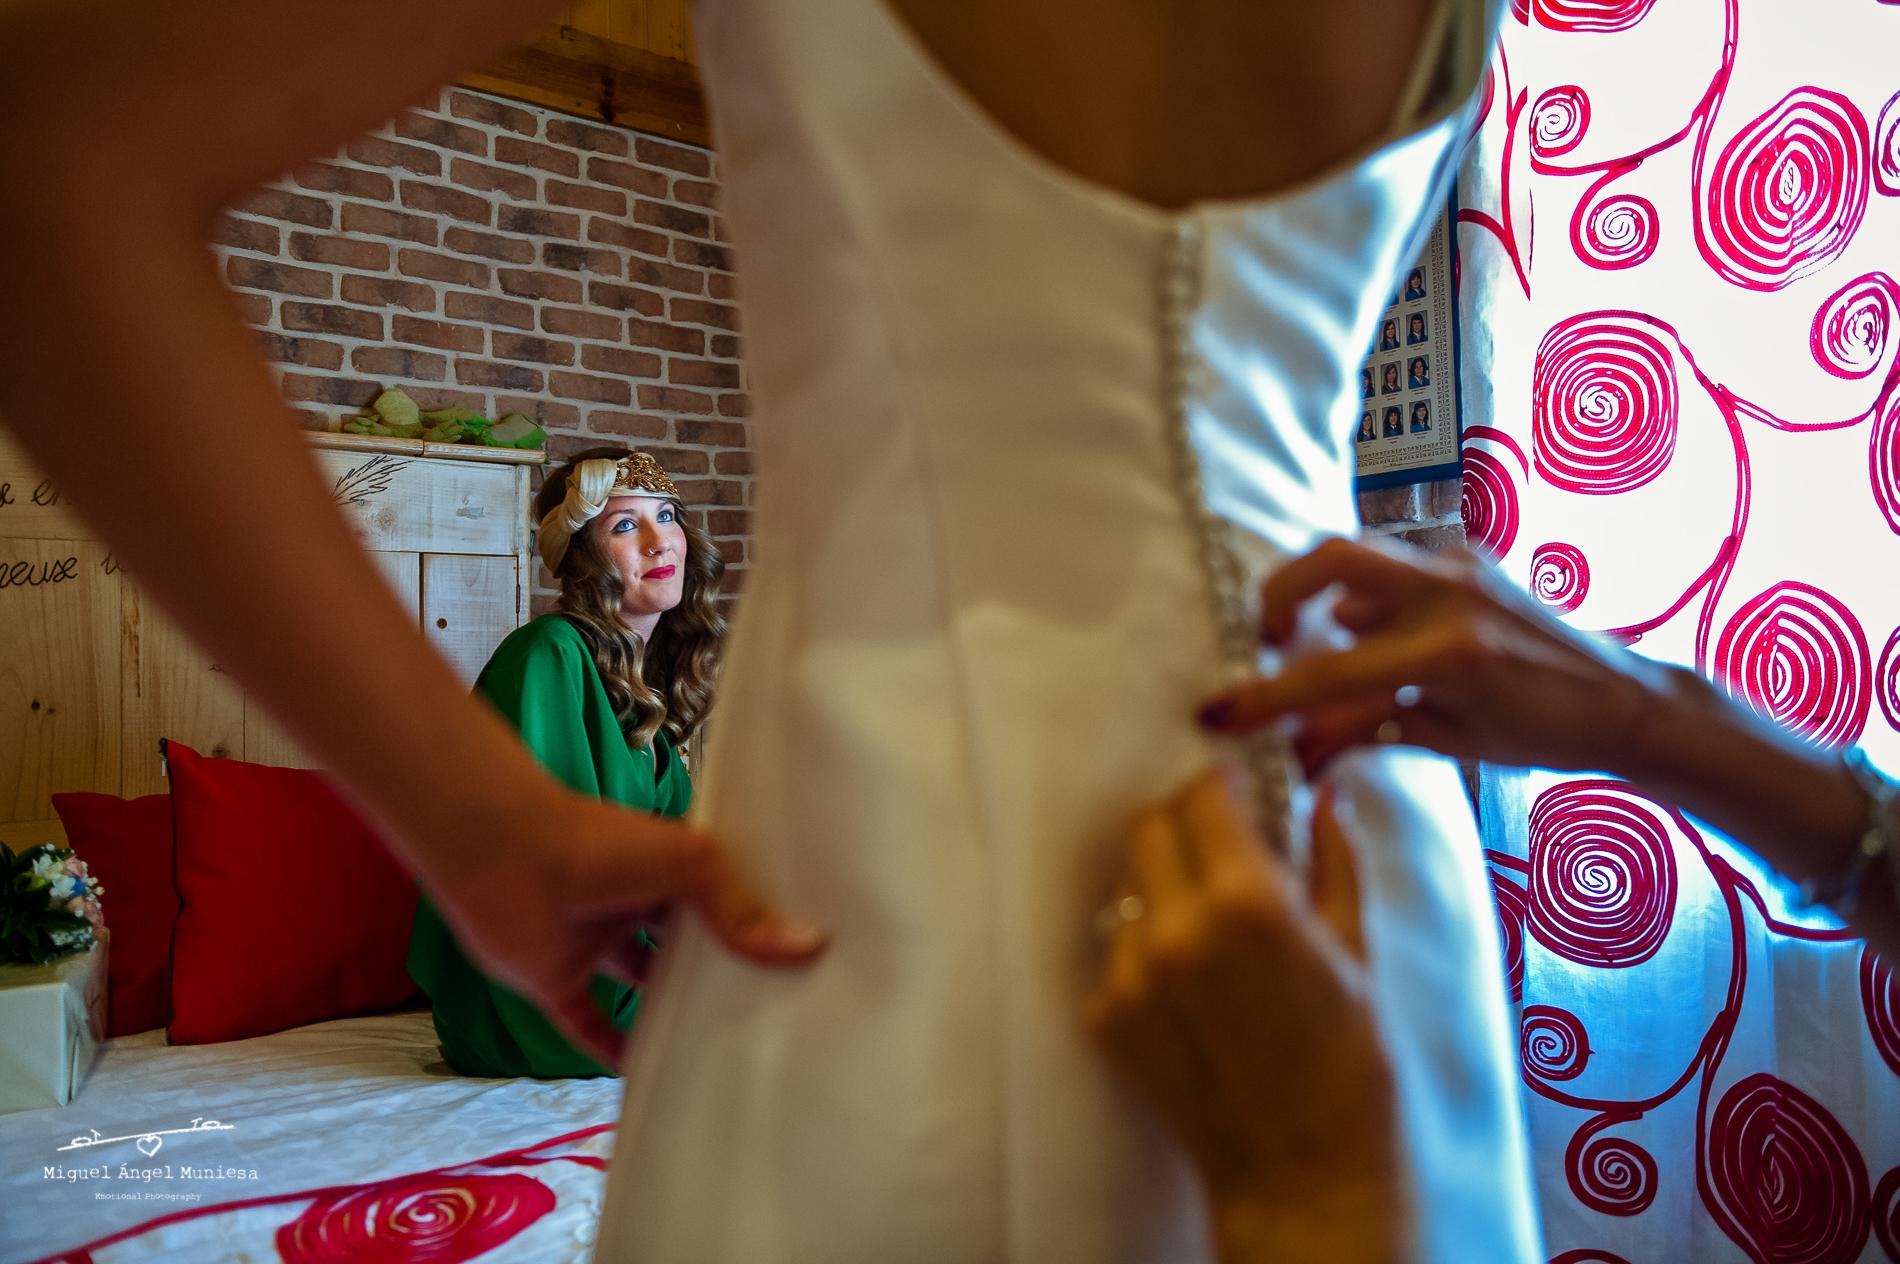 boda, fotografia de boda, boda zaragoza, fotografia, wedding, wedding photography, miguel angel muniesa, fotografo boda Zaragoza, fotografo boda, destination wedding_ 014